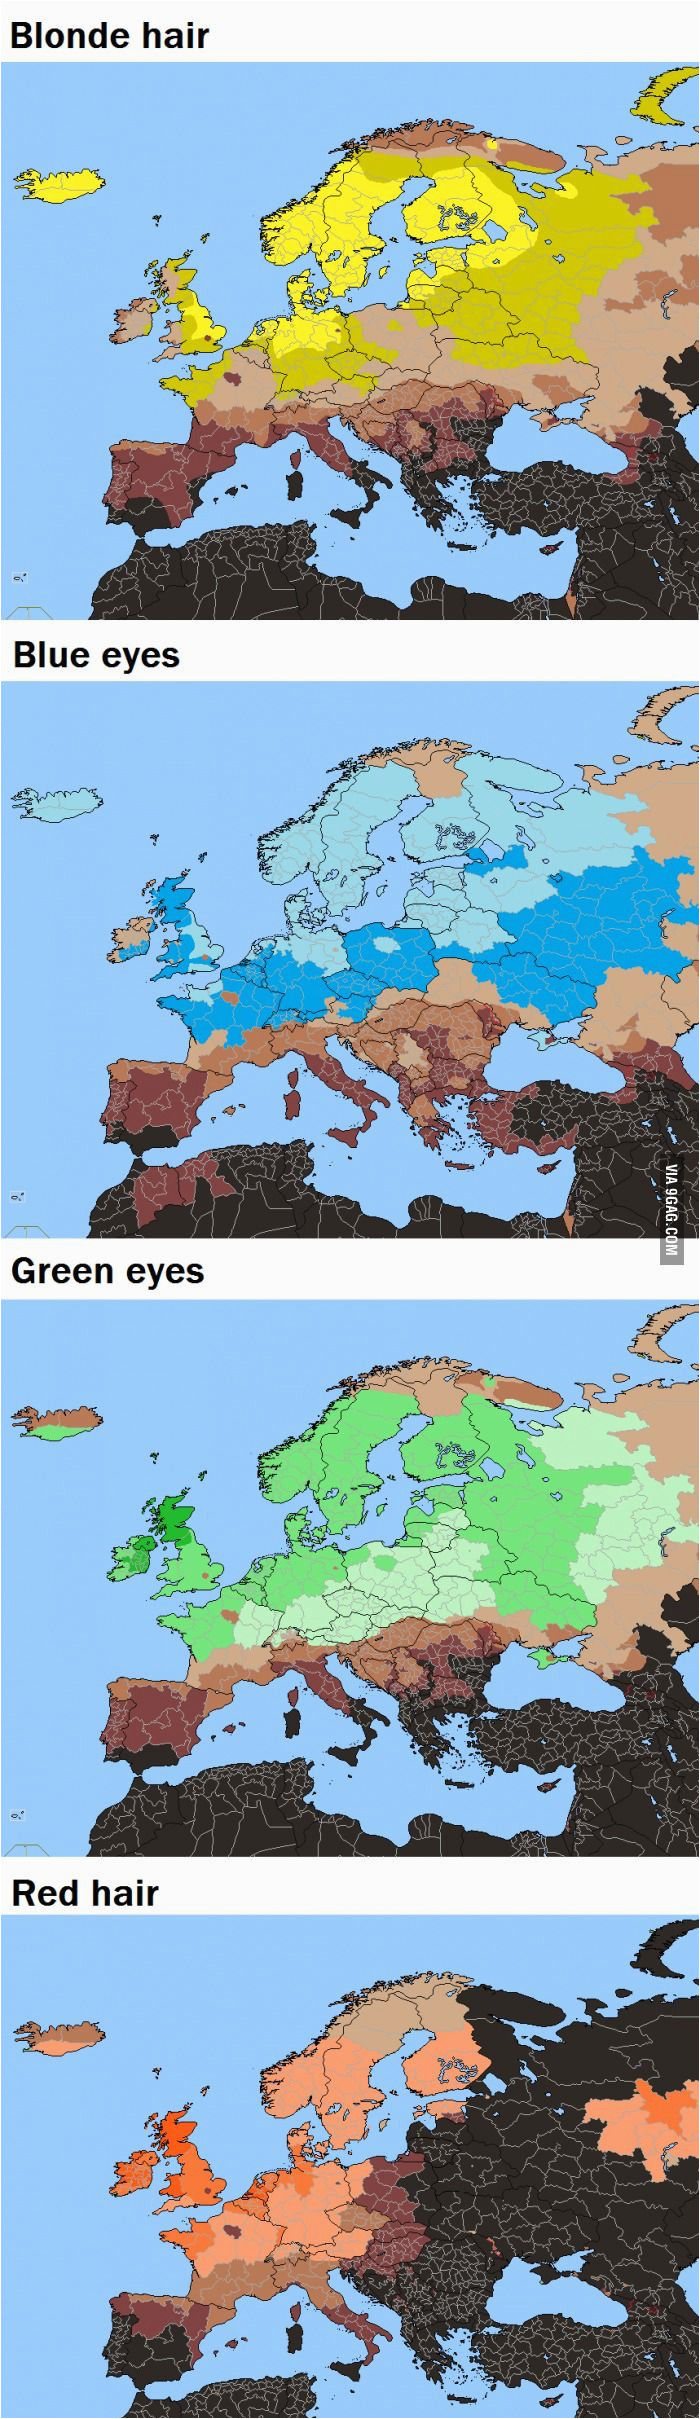 Red Hair Map Of Europe Blonde Hair Red Hair Blue Eyes In Europe Jewelry